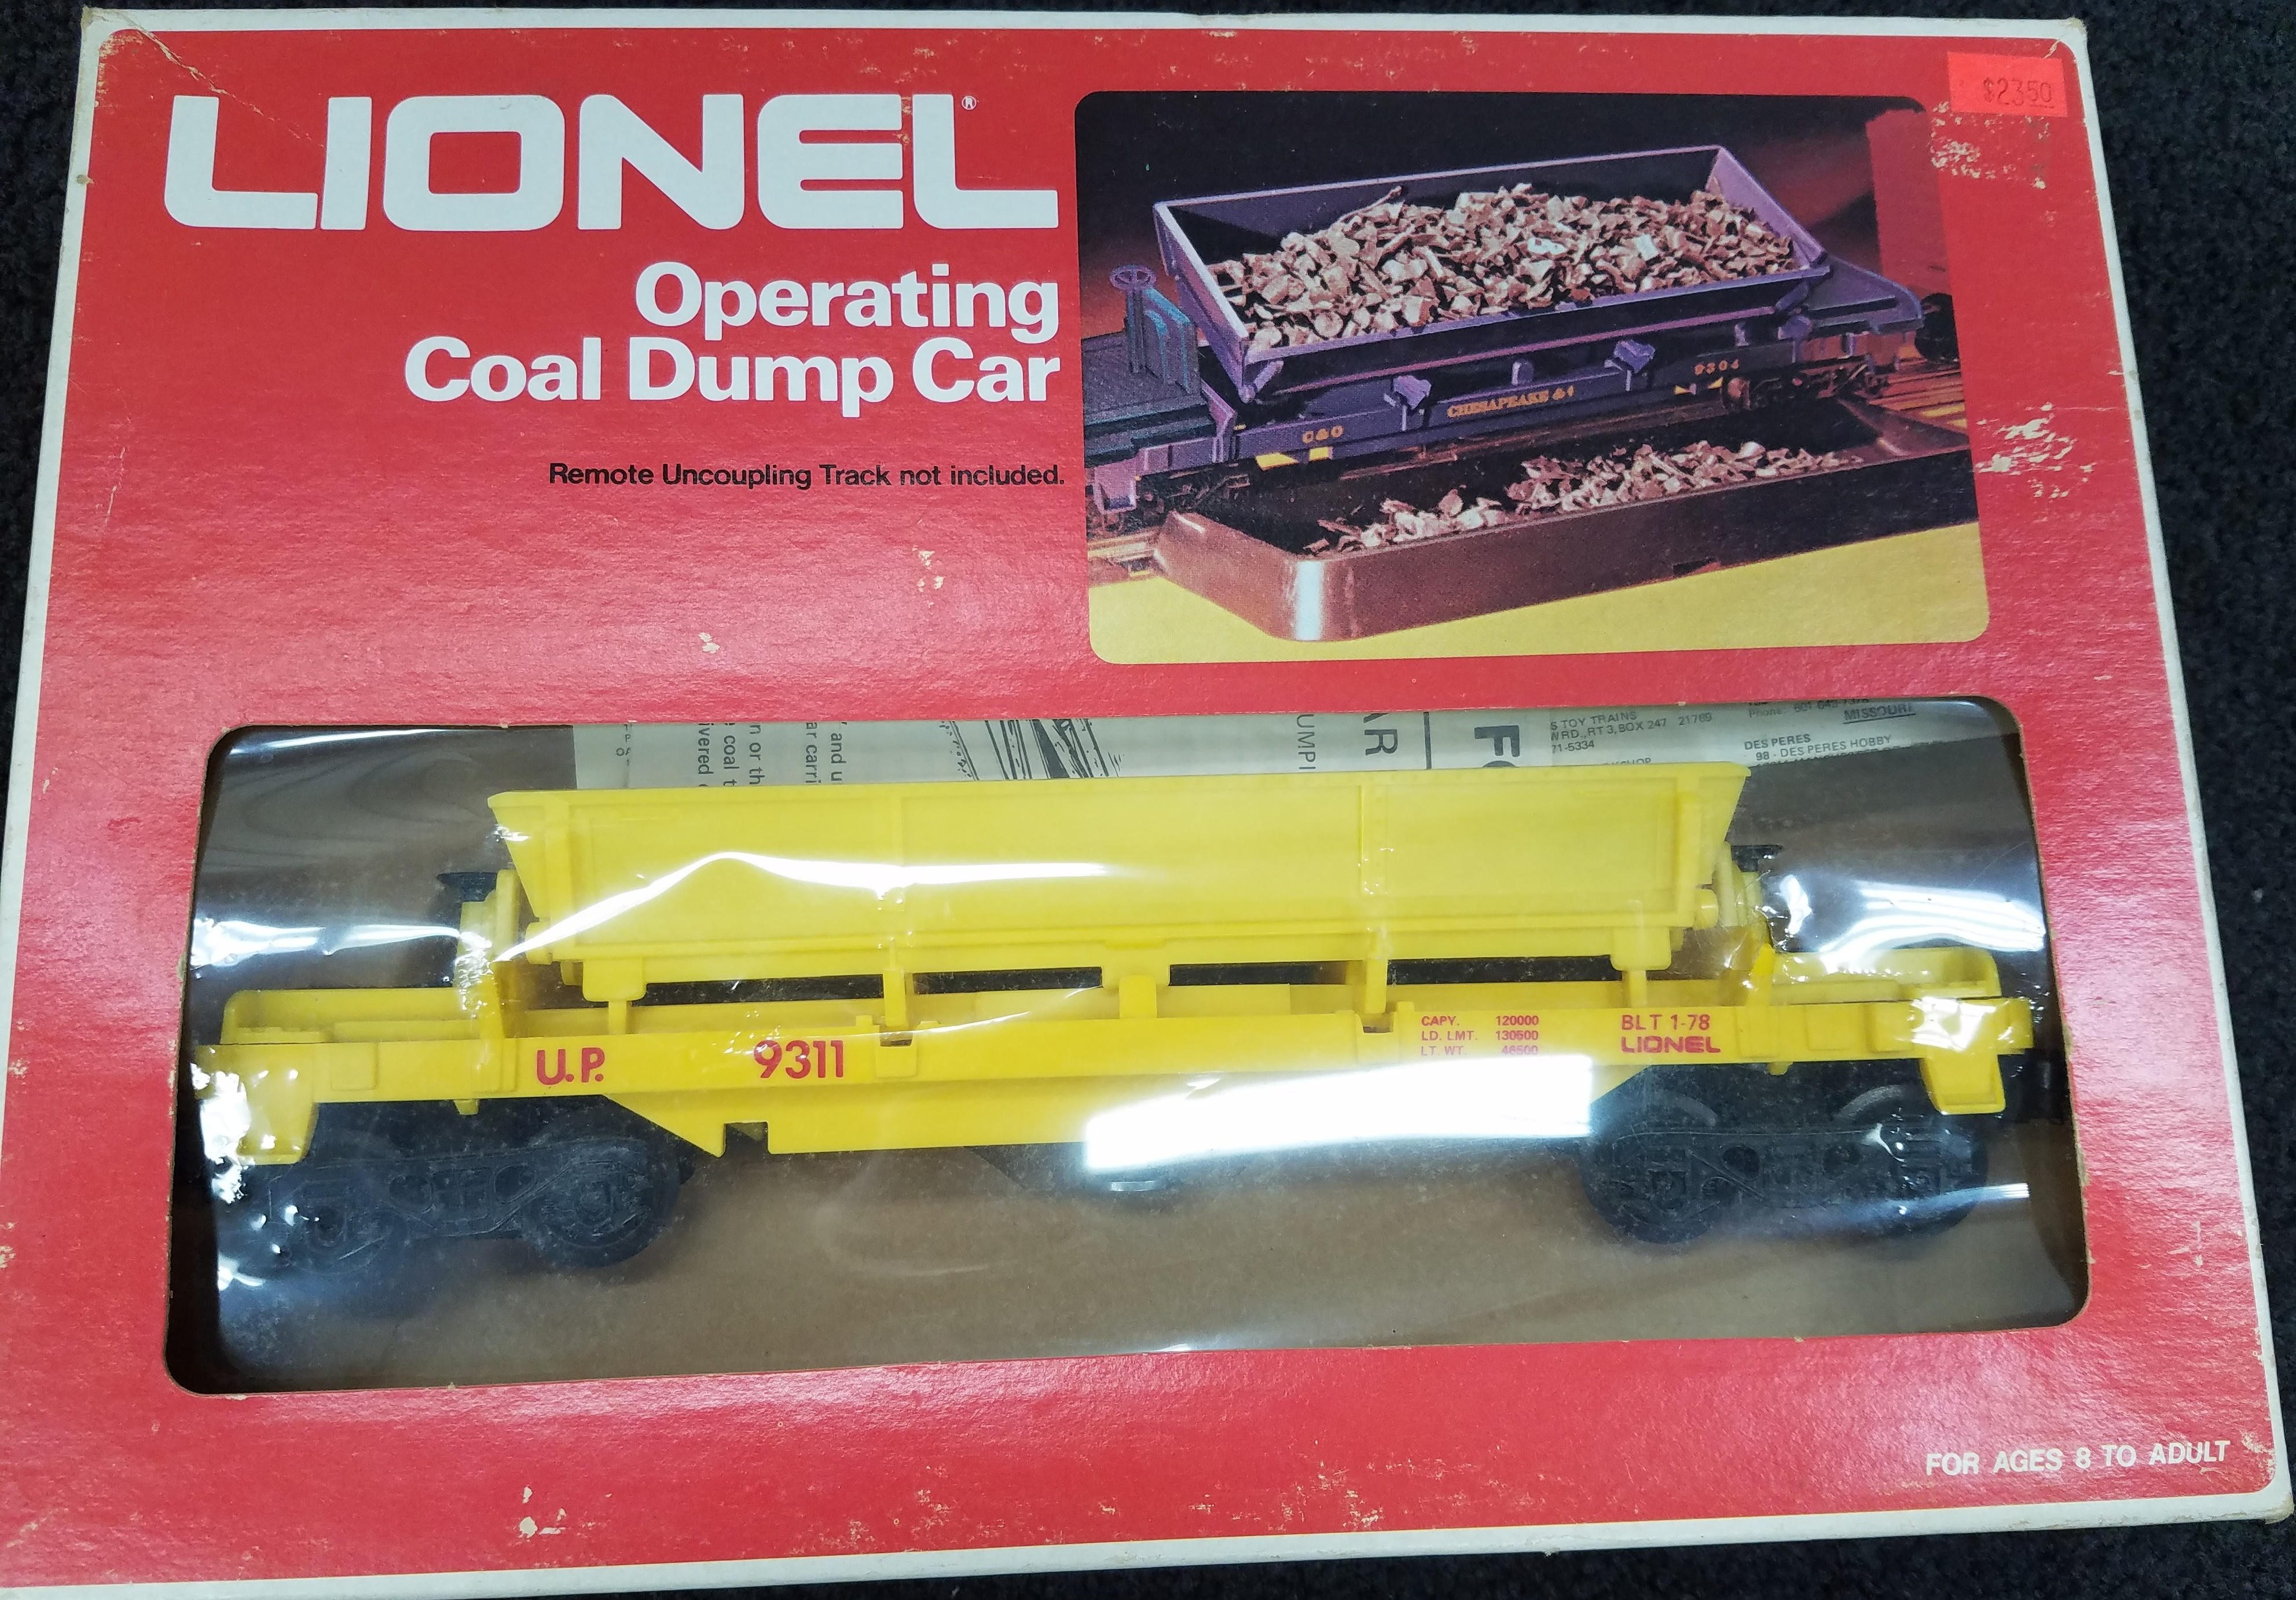 LIONEL 6-9311 OPERATING COAL DUMP CAR